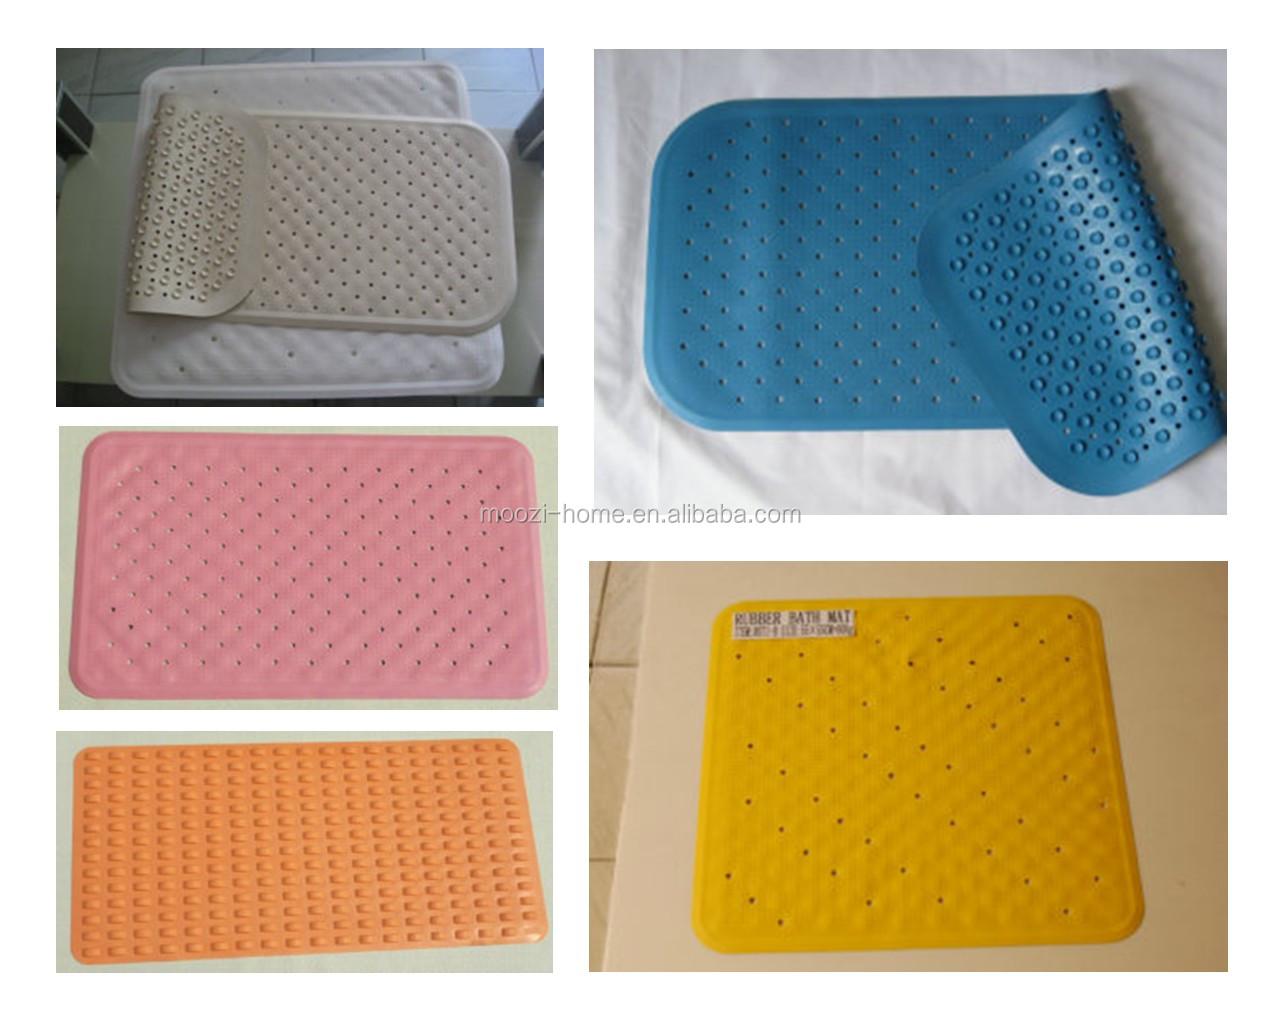 Rubber Door Mat Blue strip gator grip bathtub mat. Rubber Door Mat Blue Strip Gator Grip Bathtub Mat   Buy Gator Grip